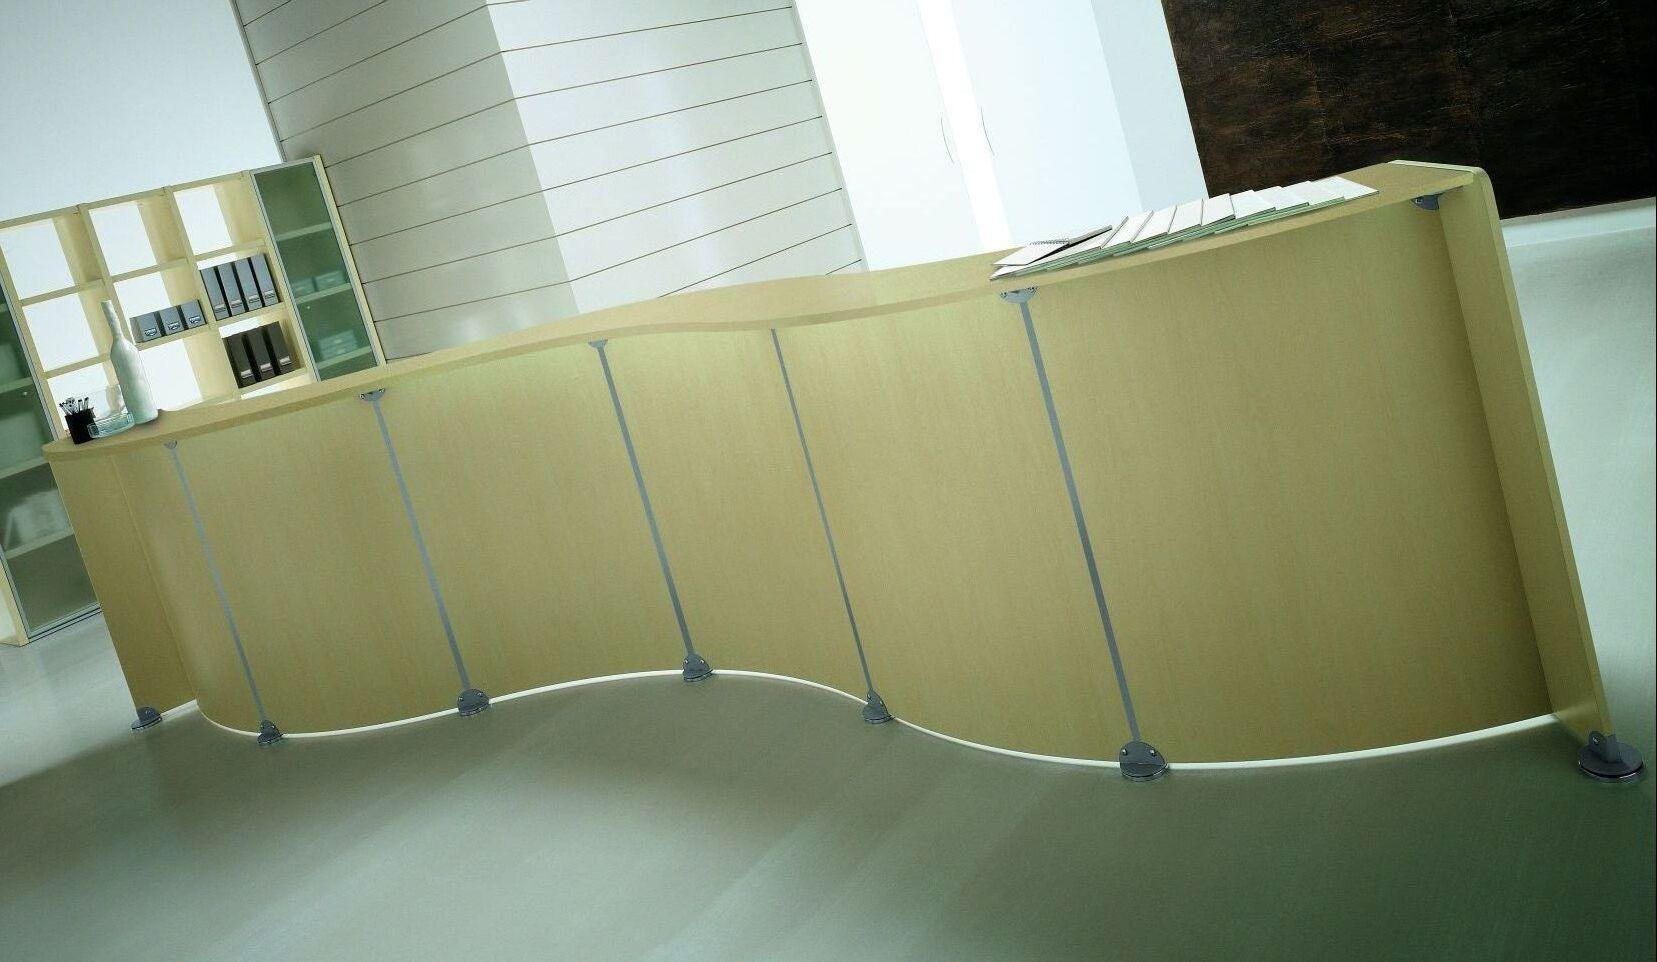 Reception-mid-level-IMAGE 36